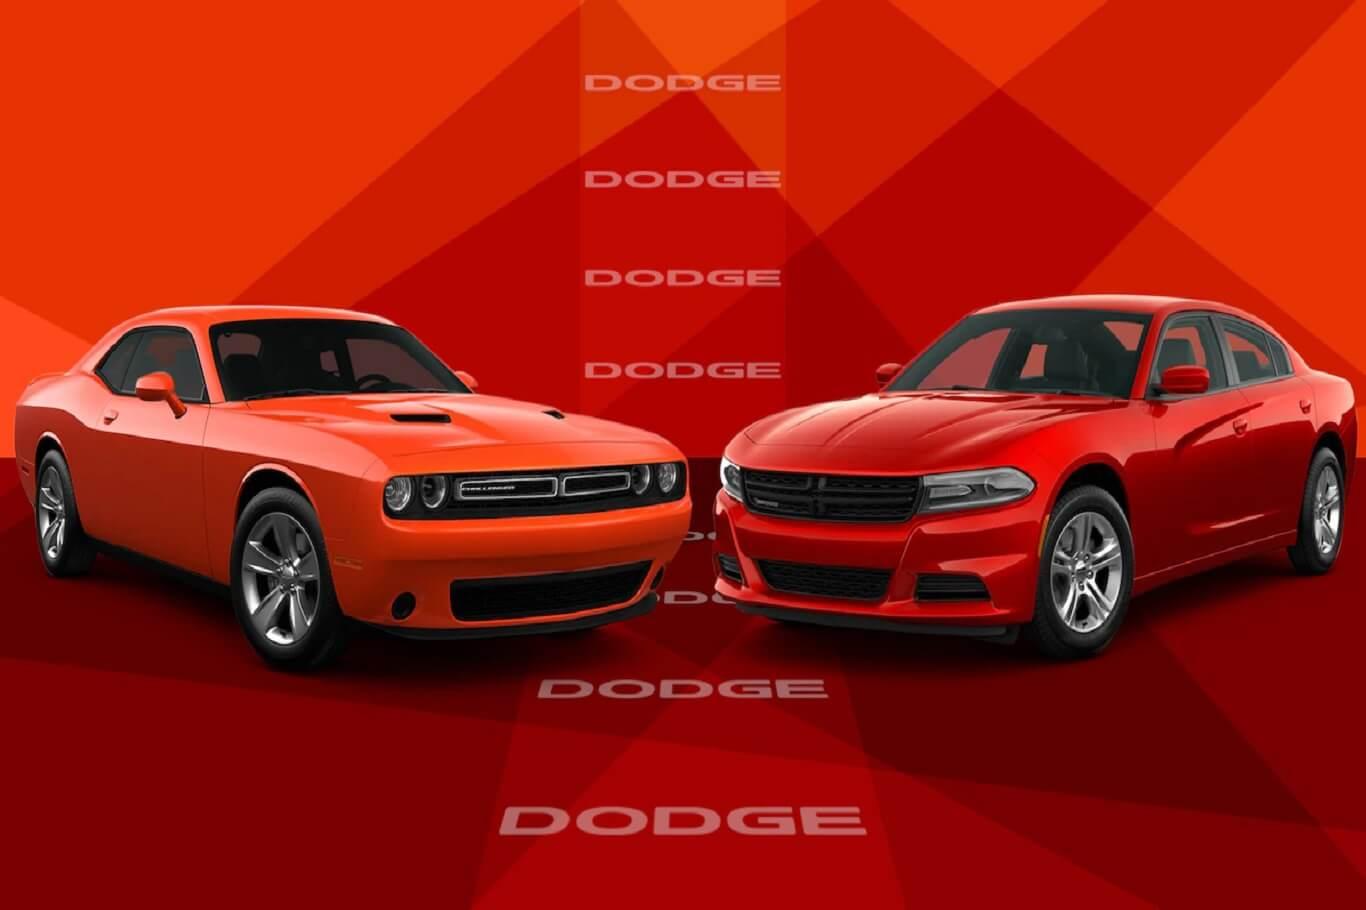 Dodge Charger vs. Challenger